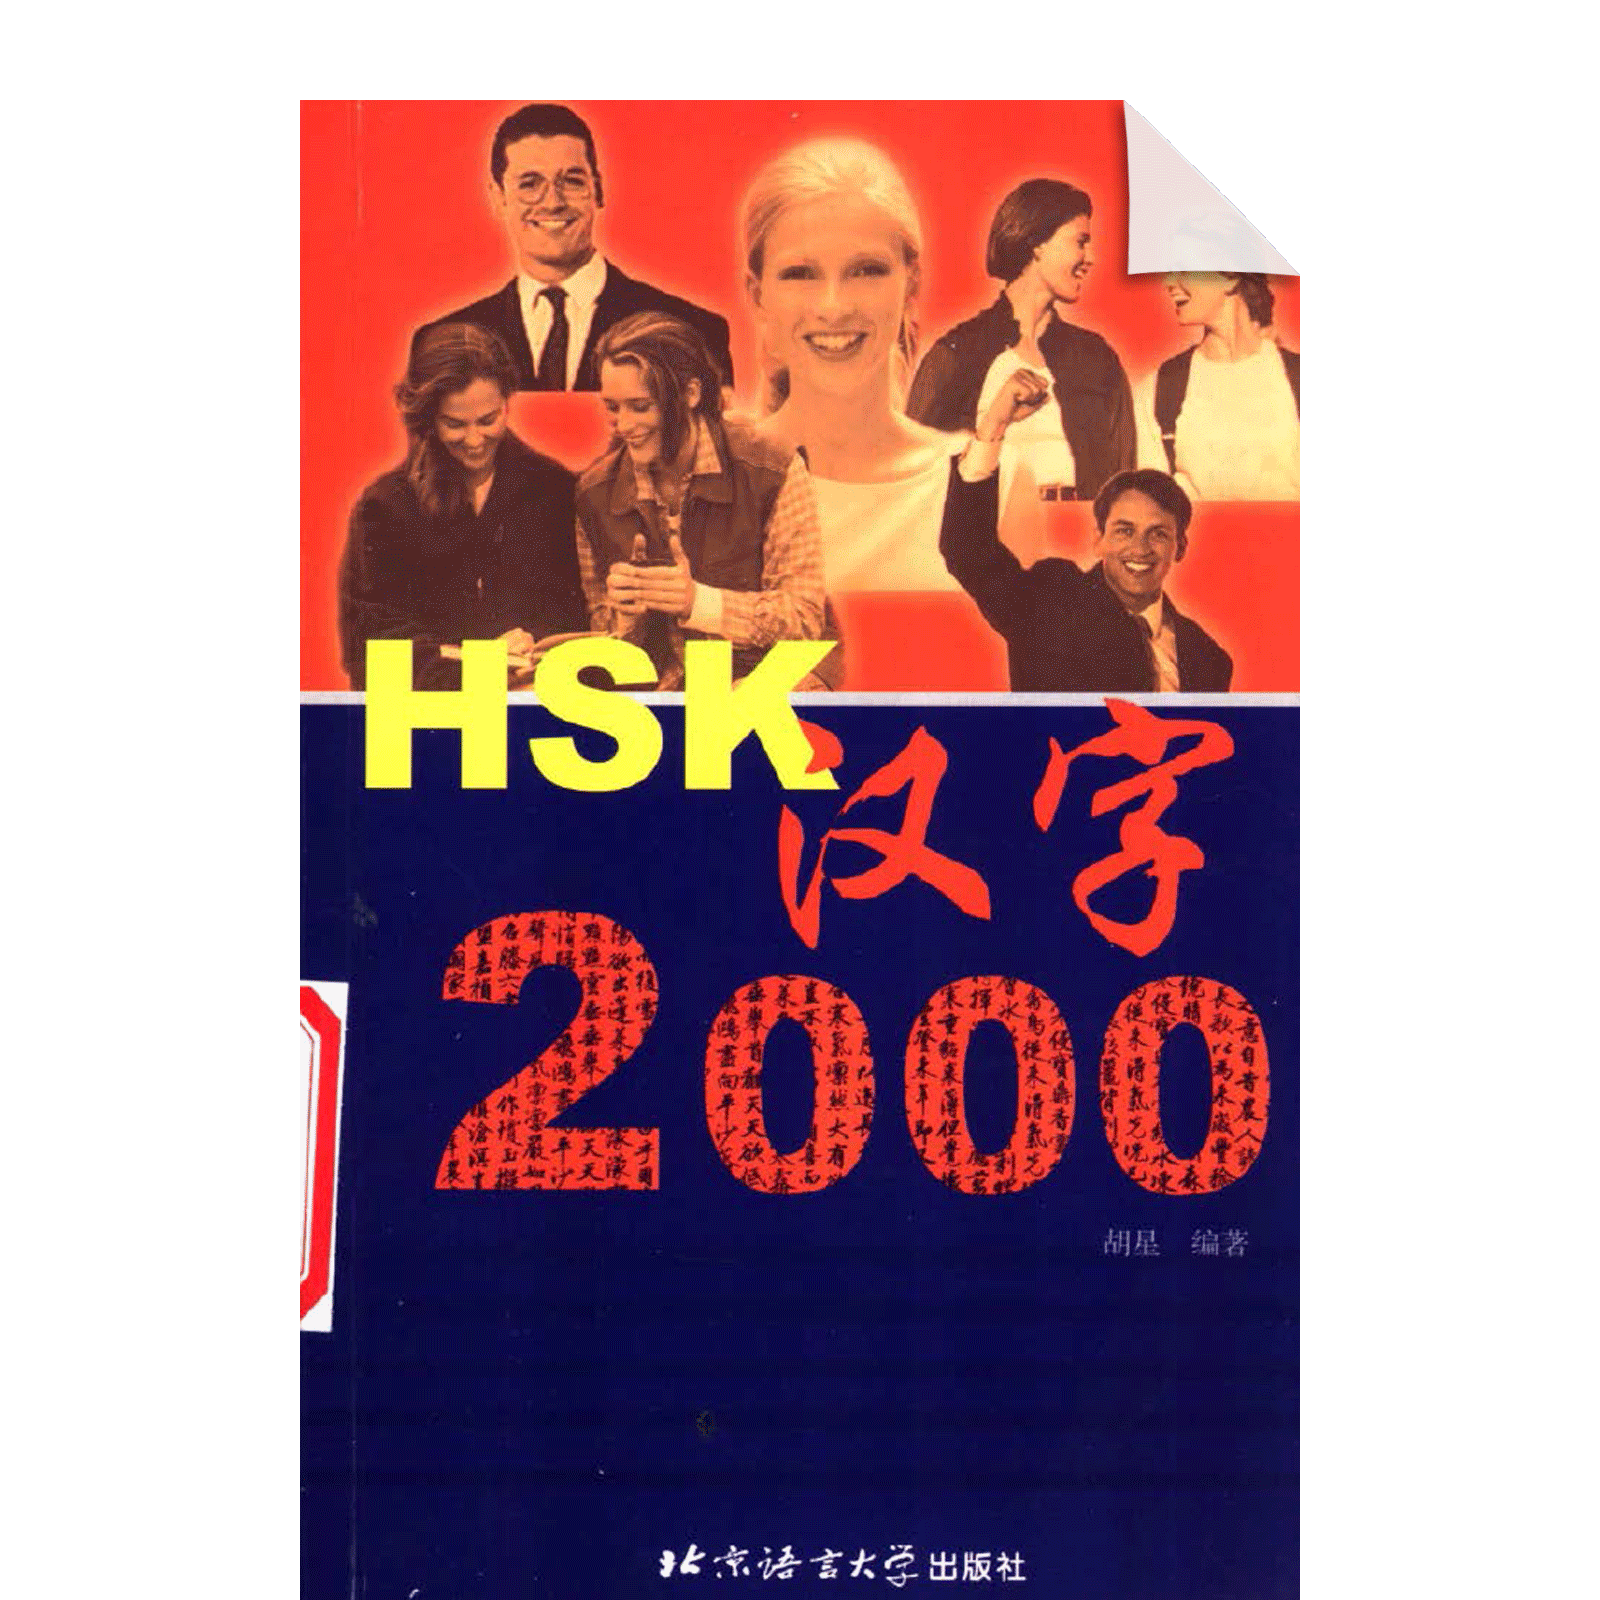 HSK Hanzi 2000